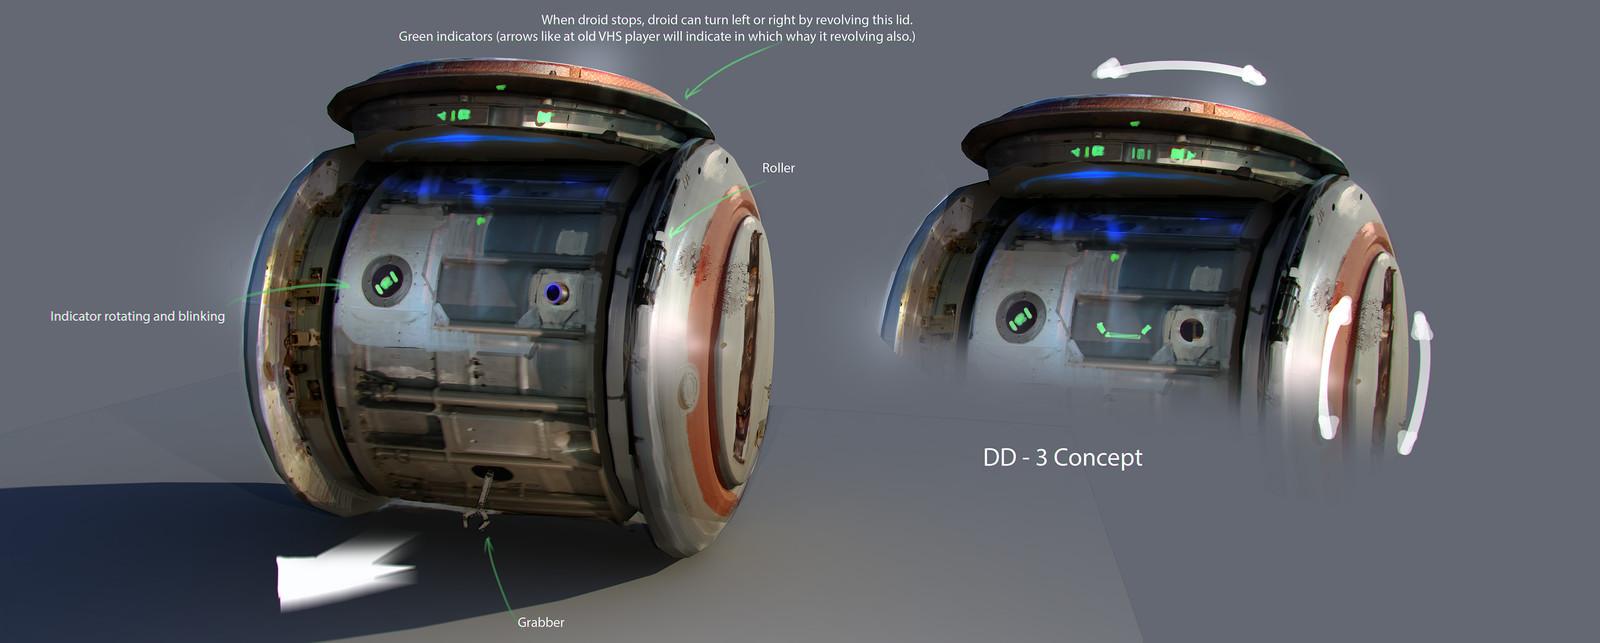 DD3 concept art